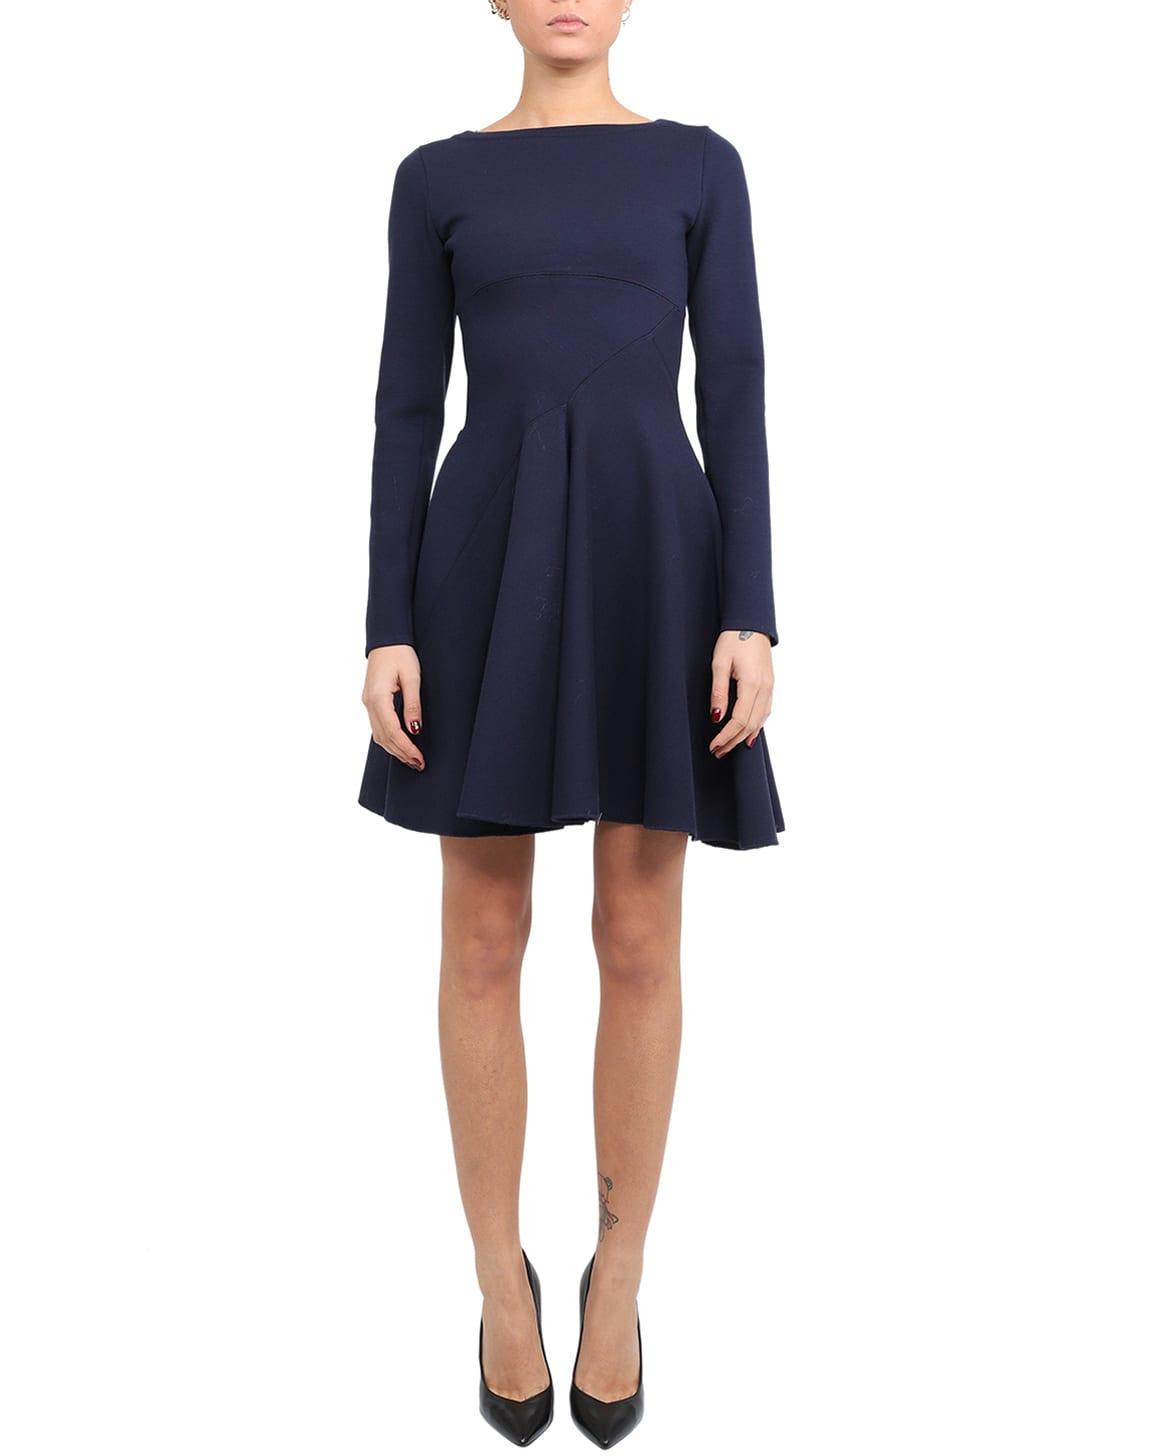 Azzedine Alaia Blue Skater Dress